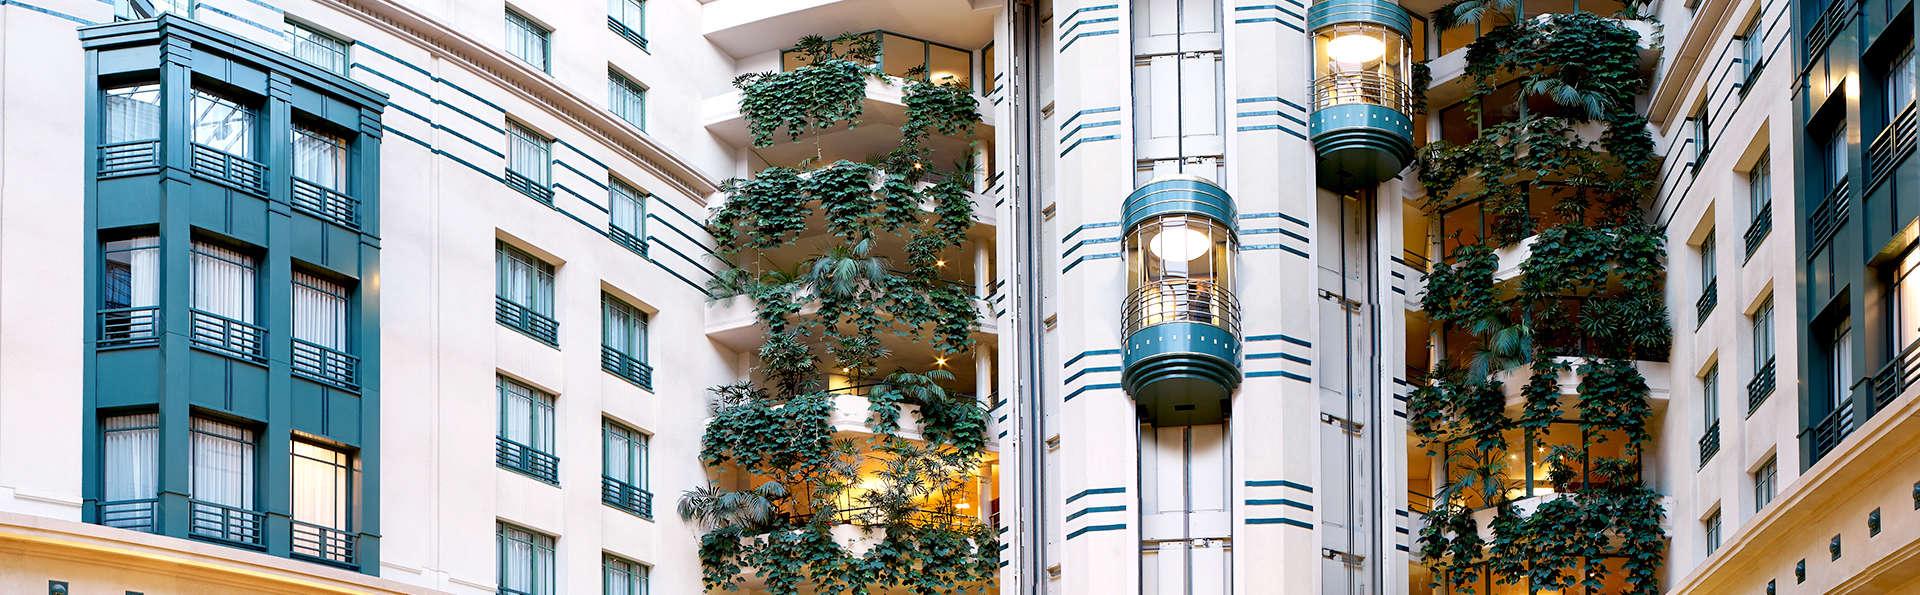 Radisson Blu Royal Hotel Brussels - Edit_Inside.jpg